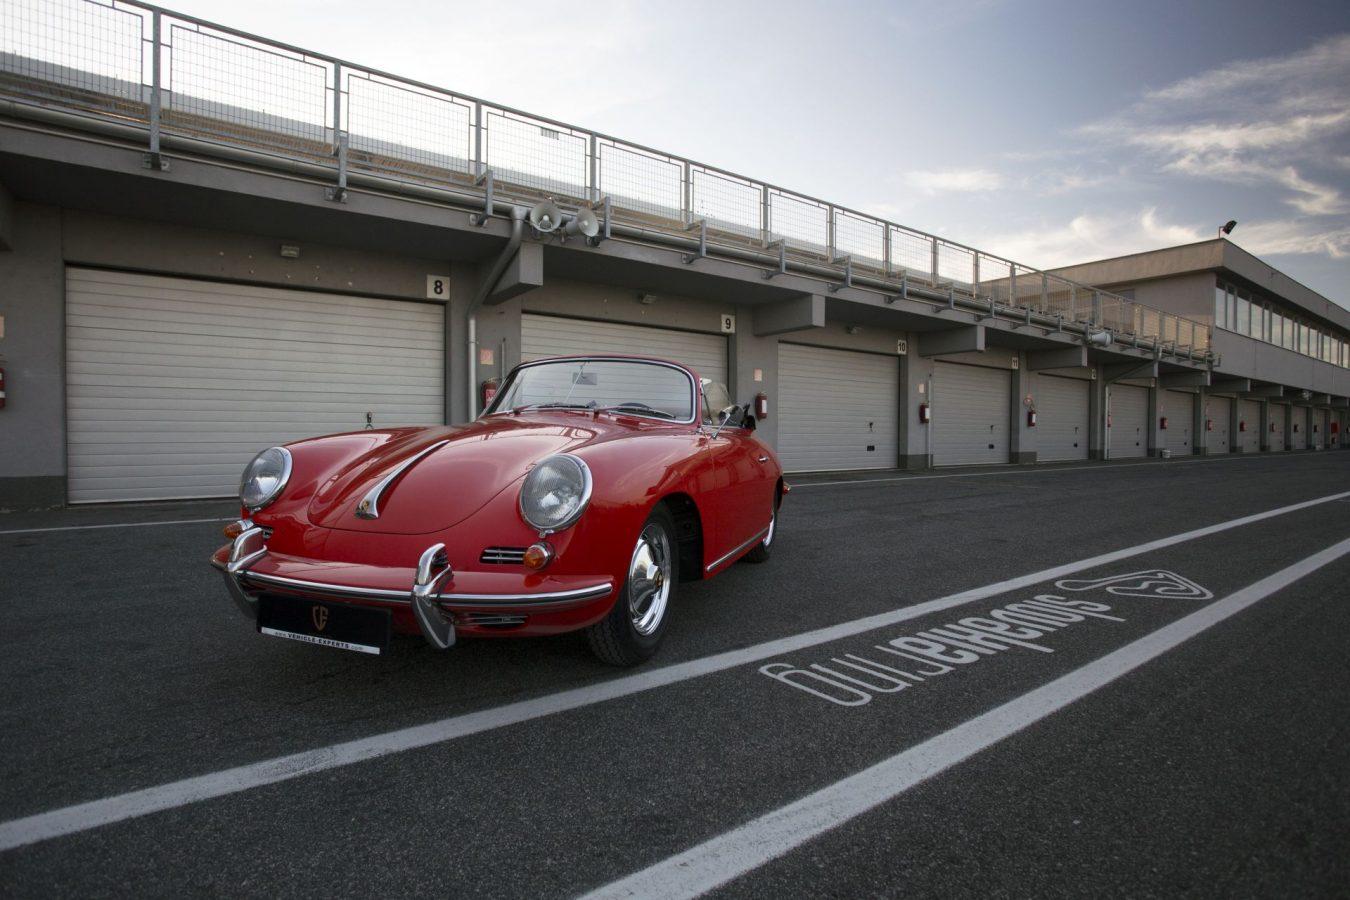 Kardinalroter Porsche 356B Super 90 Cabriolet